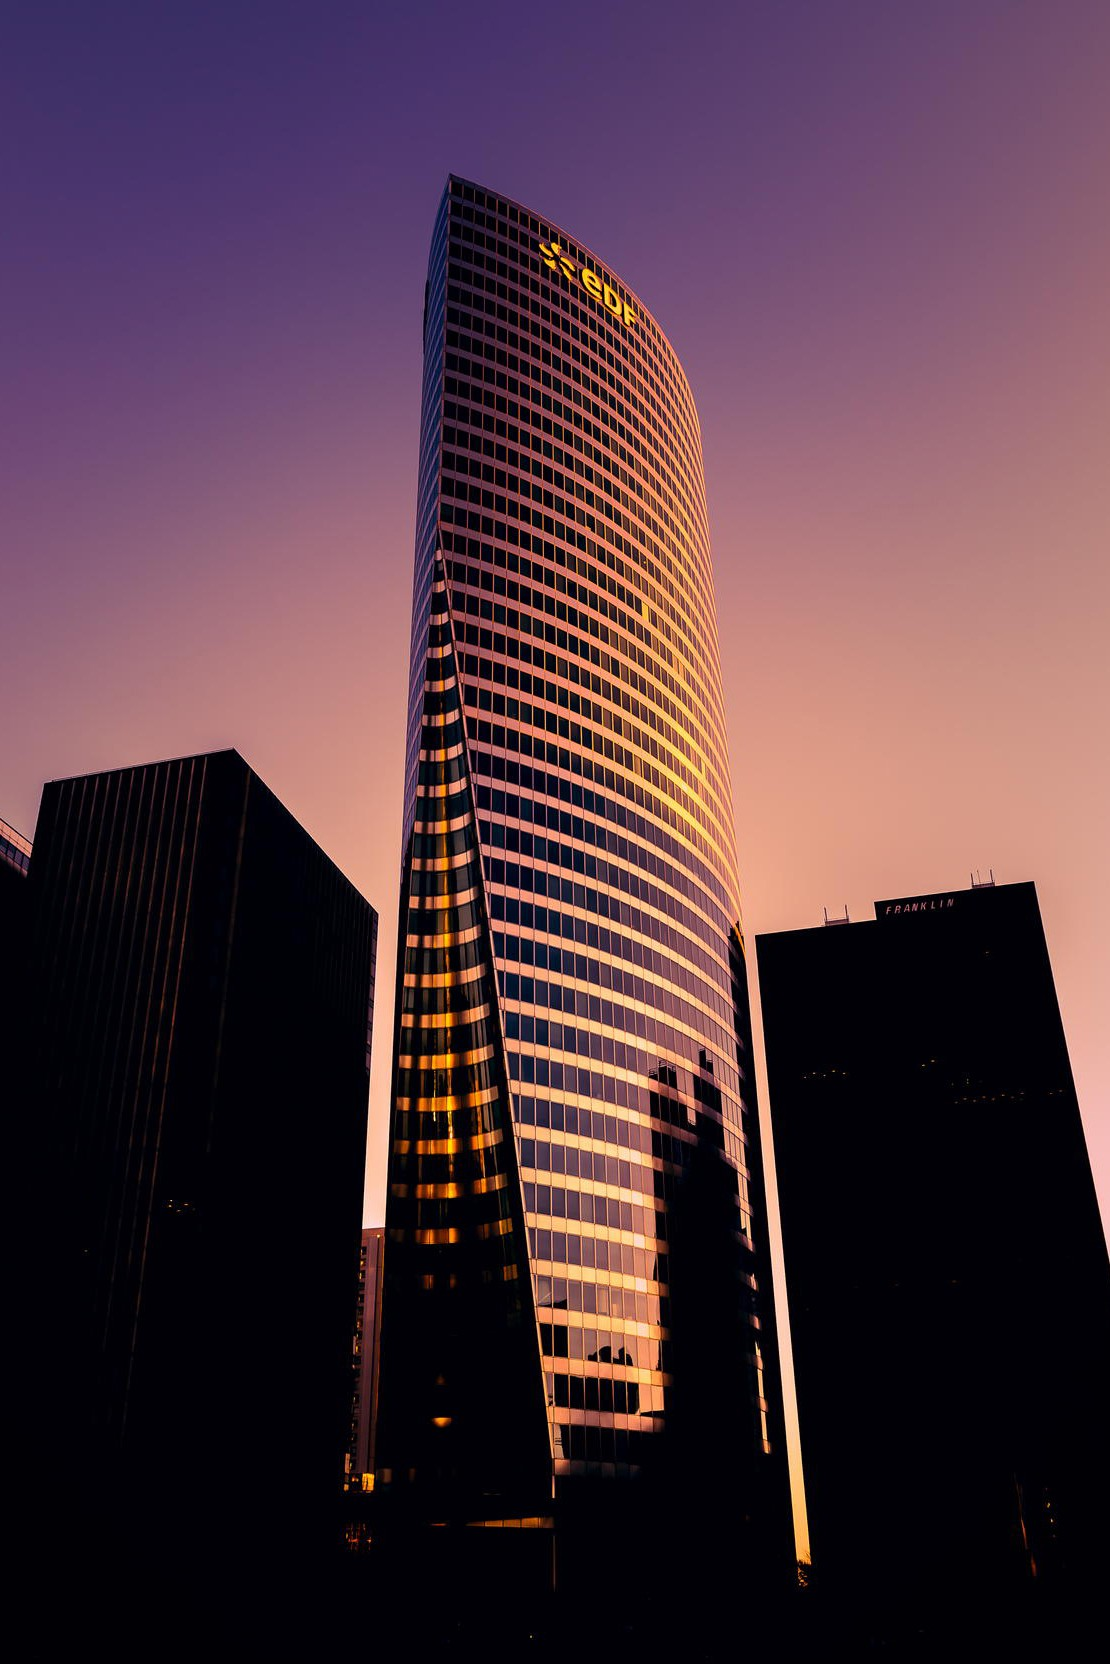 skyscraper city architecture building glass tall sky modern